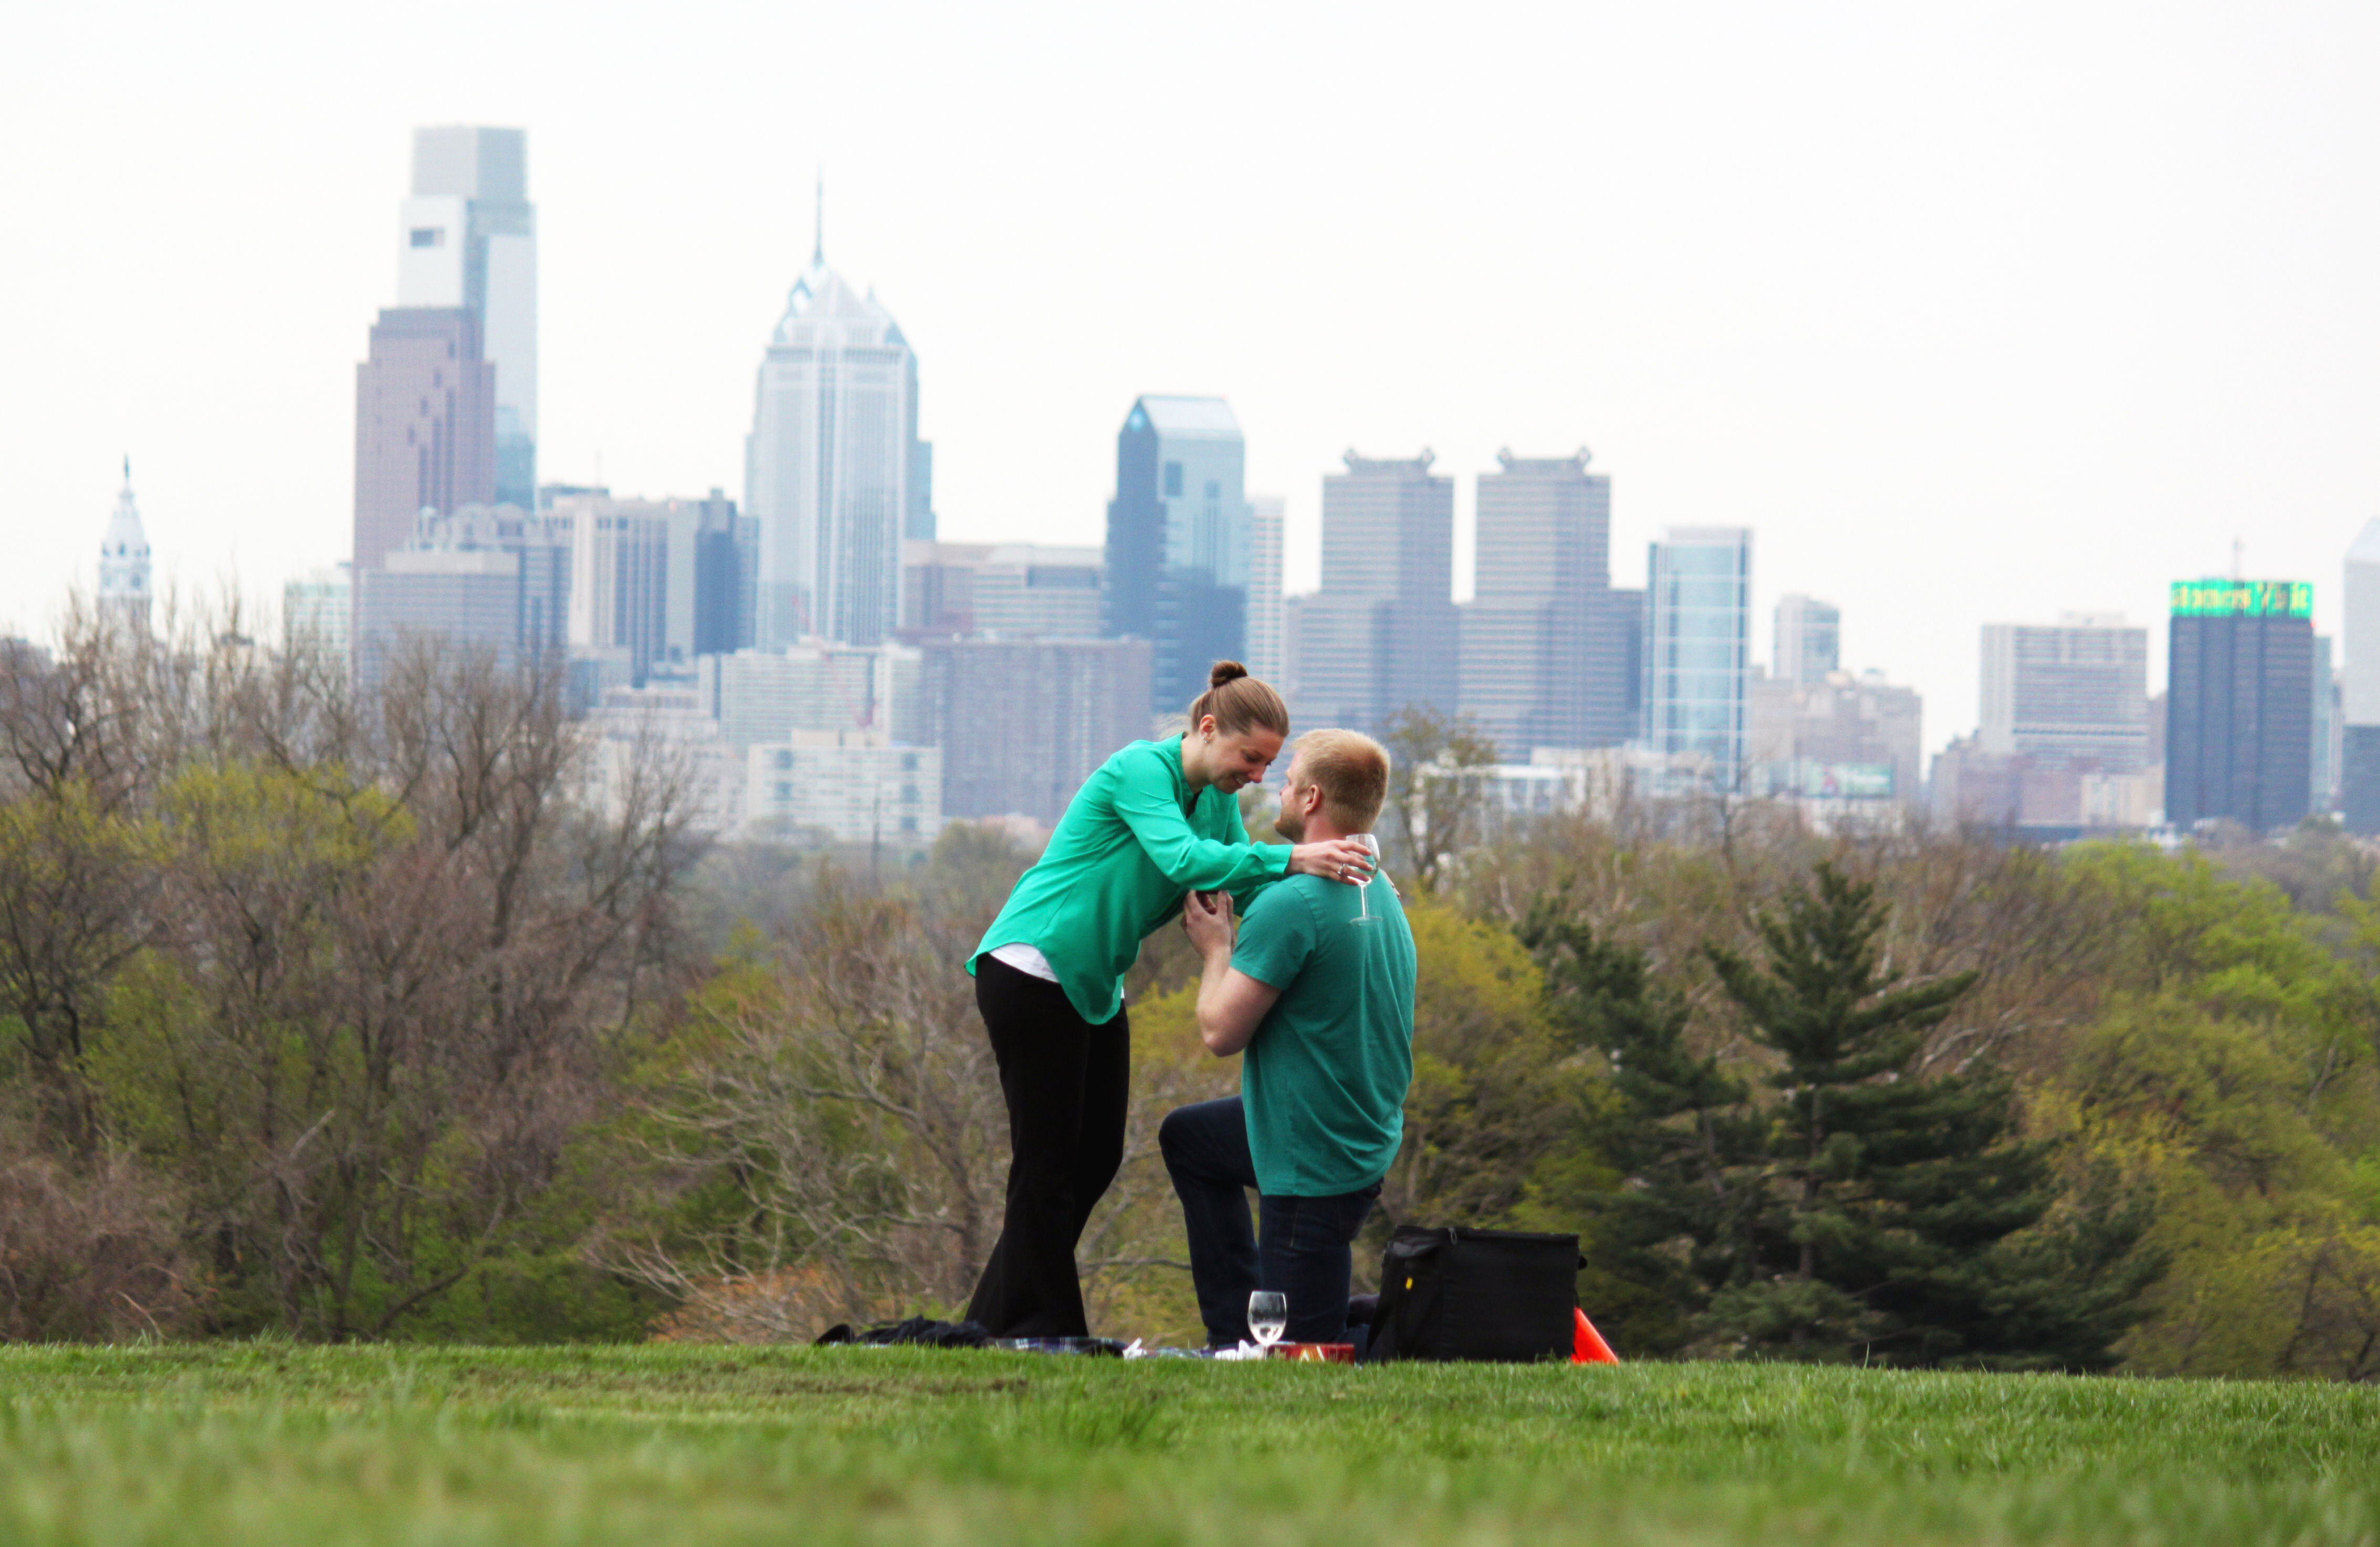 Image 4 of Amy and Tom   Philadelphia Marriage Proposal